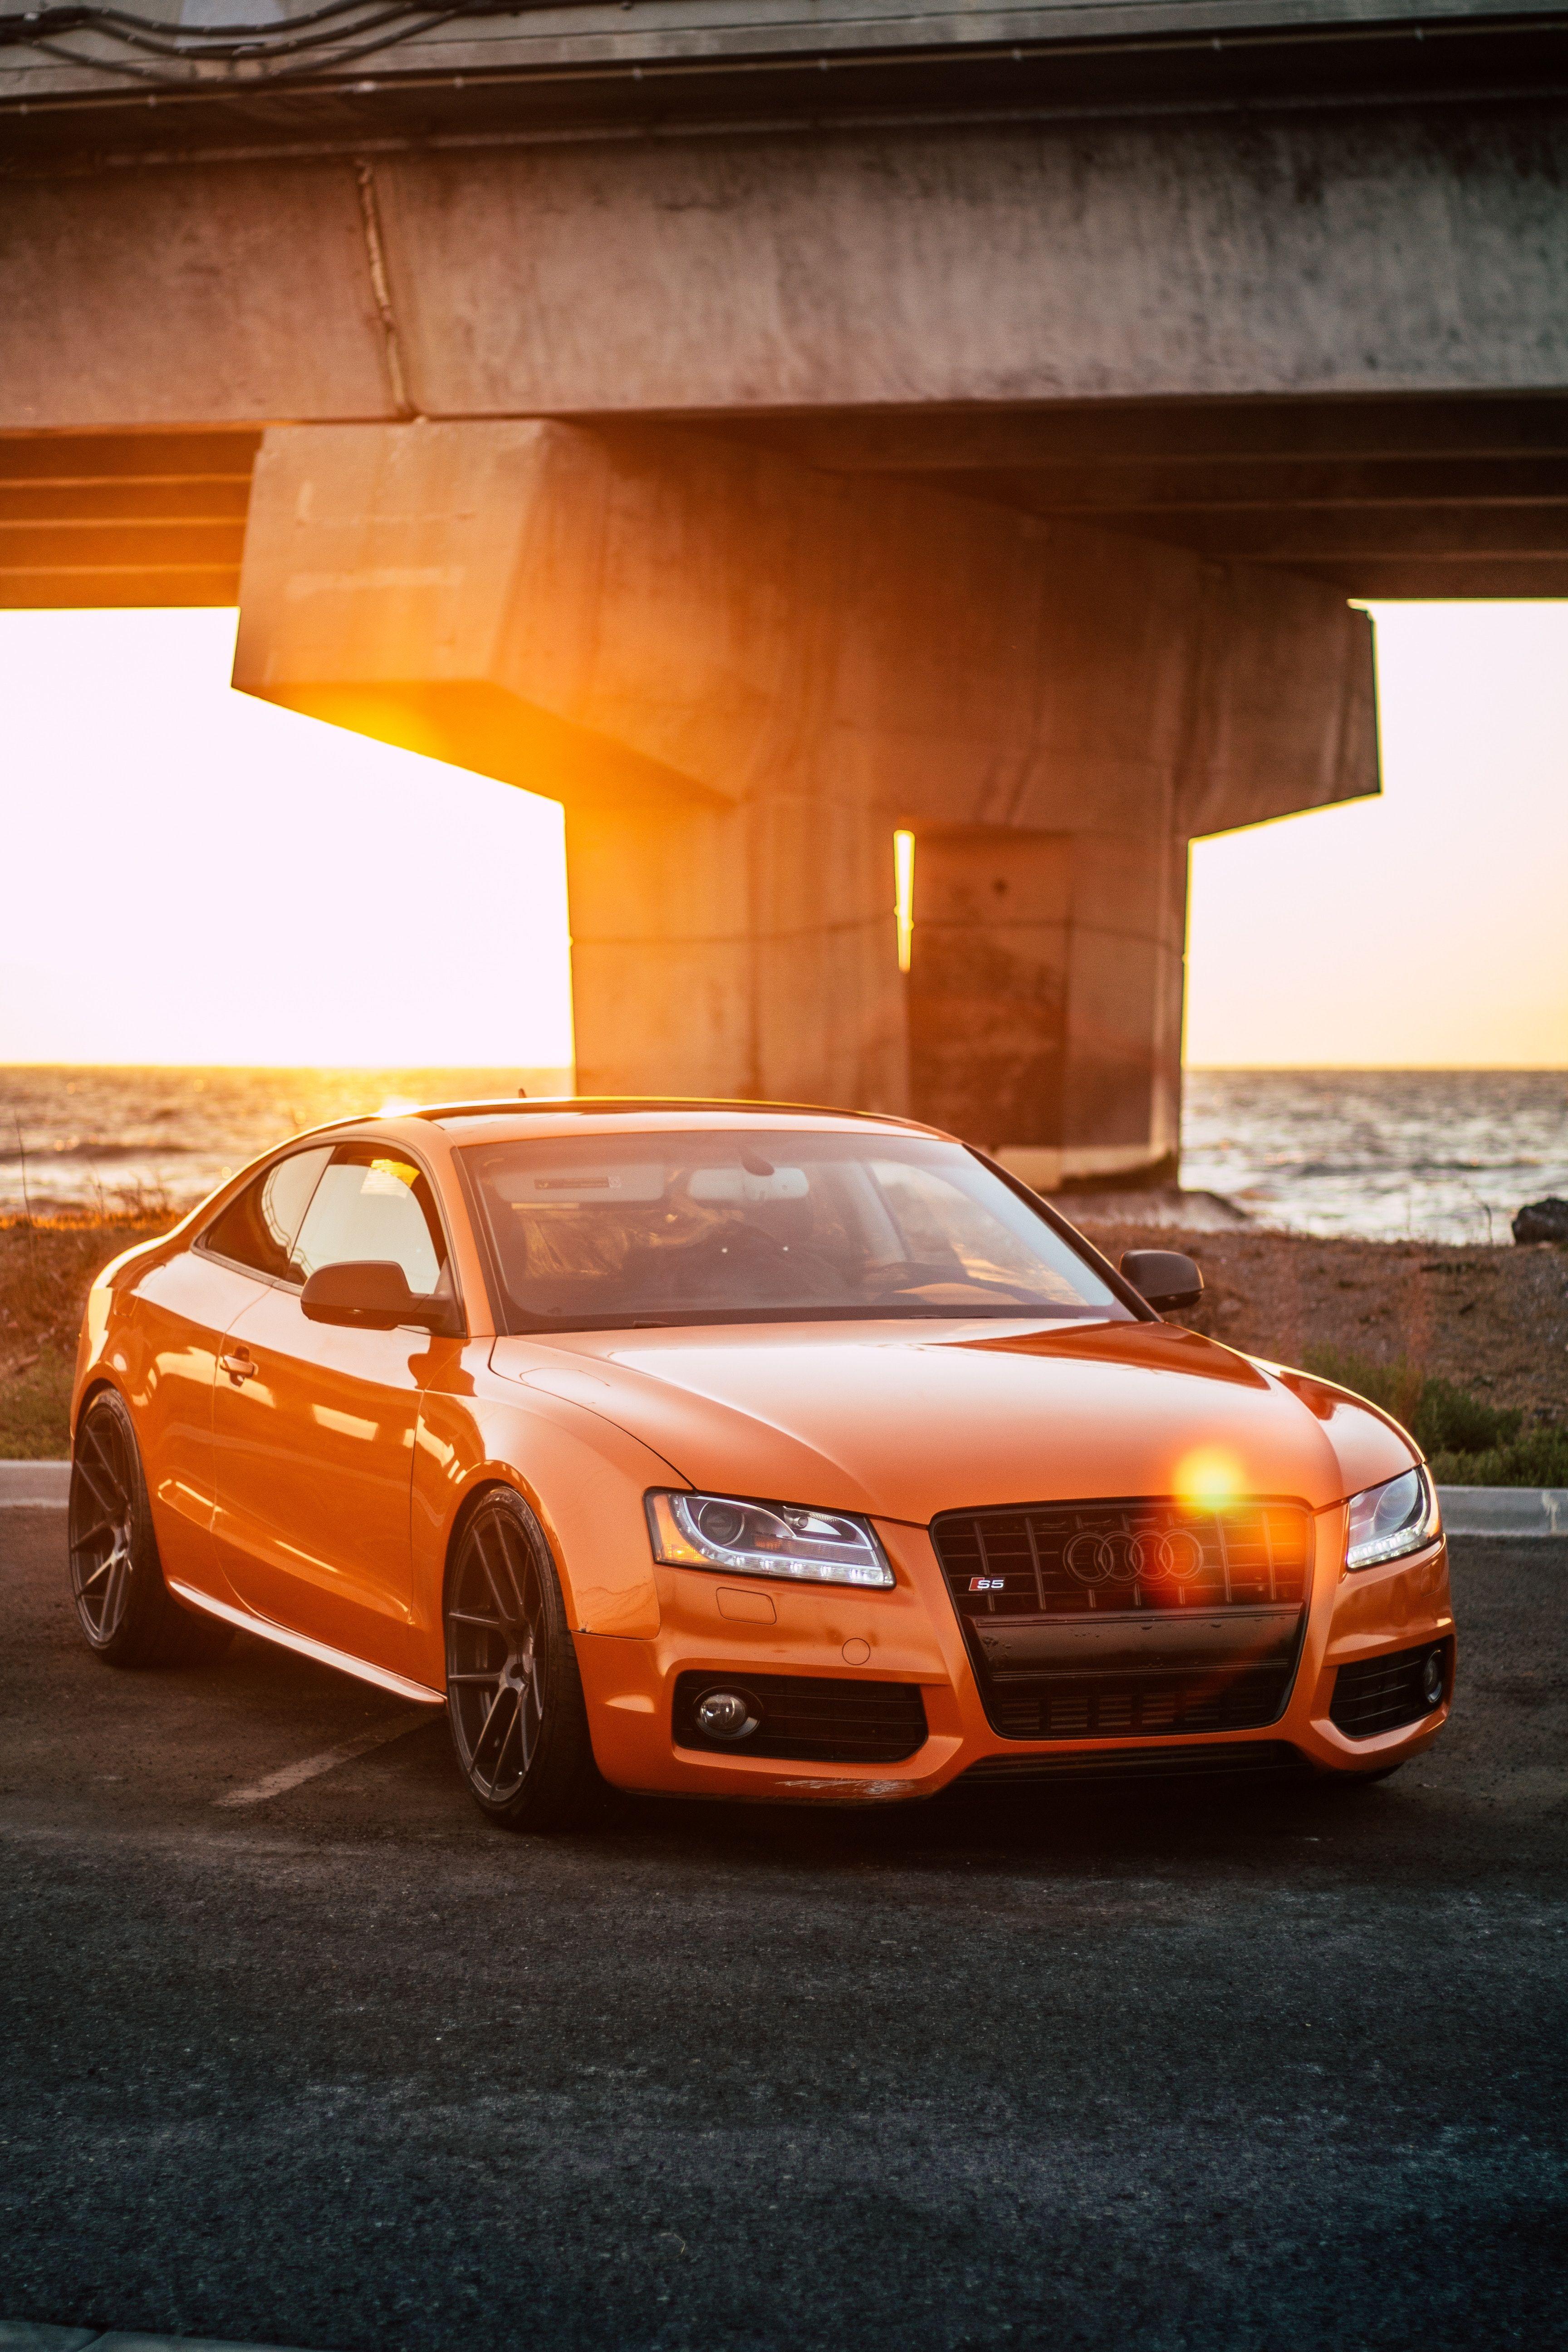 Autospix - USA Automotive News & Magazine | Cars Wallpaper